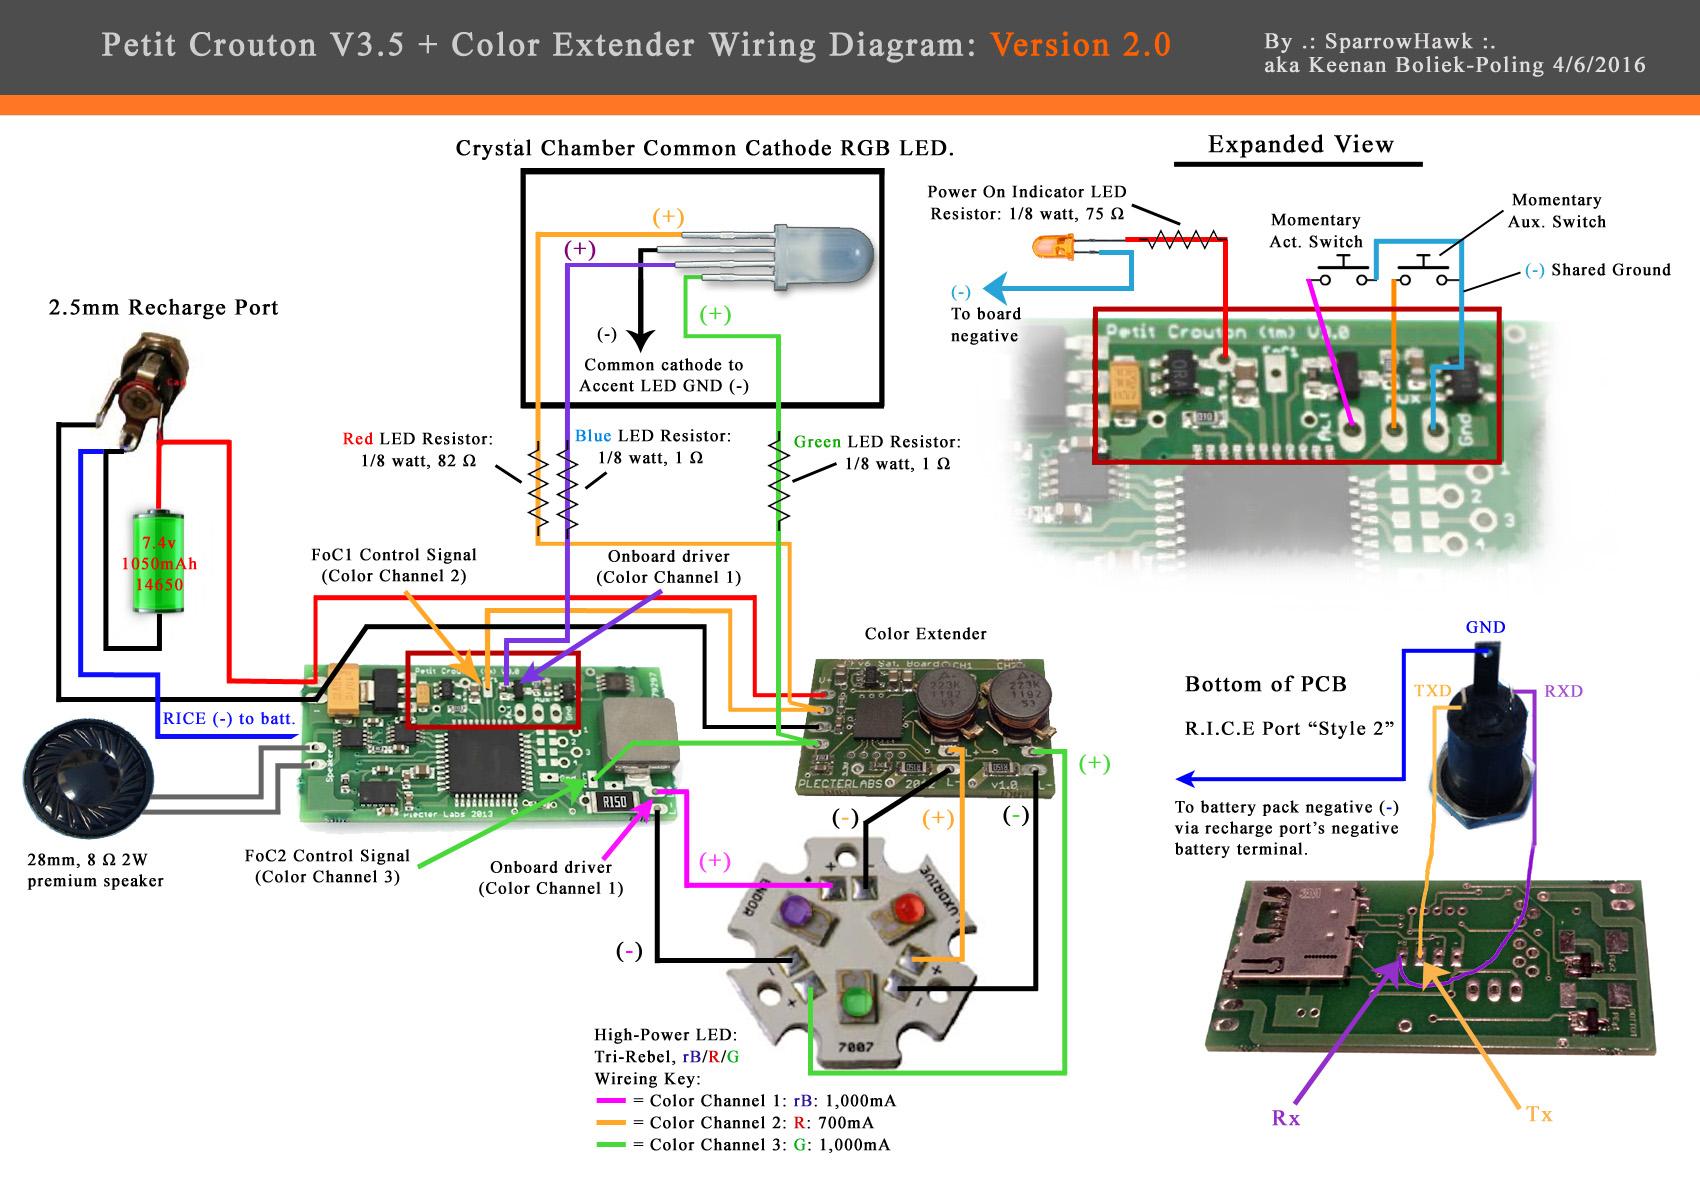 pc wiring diagram wiring diagram yer pc wire diagram [ 1700 x 1200 Pixel ]